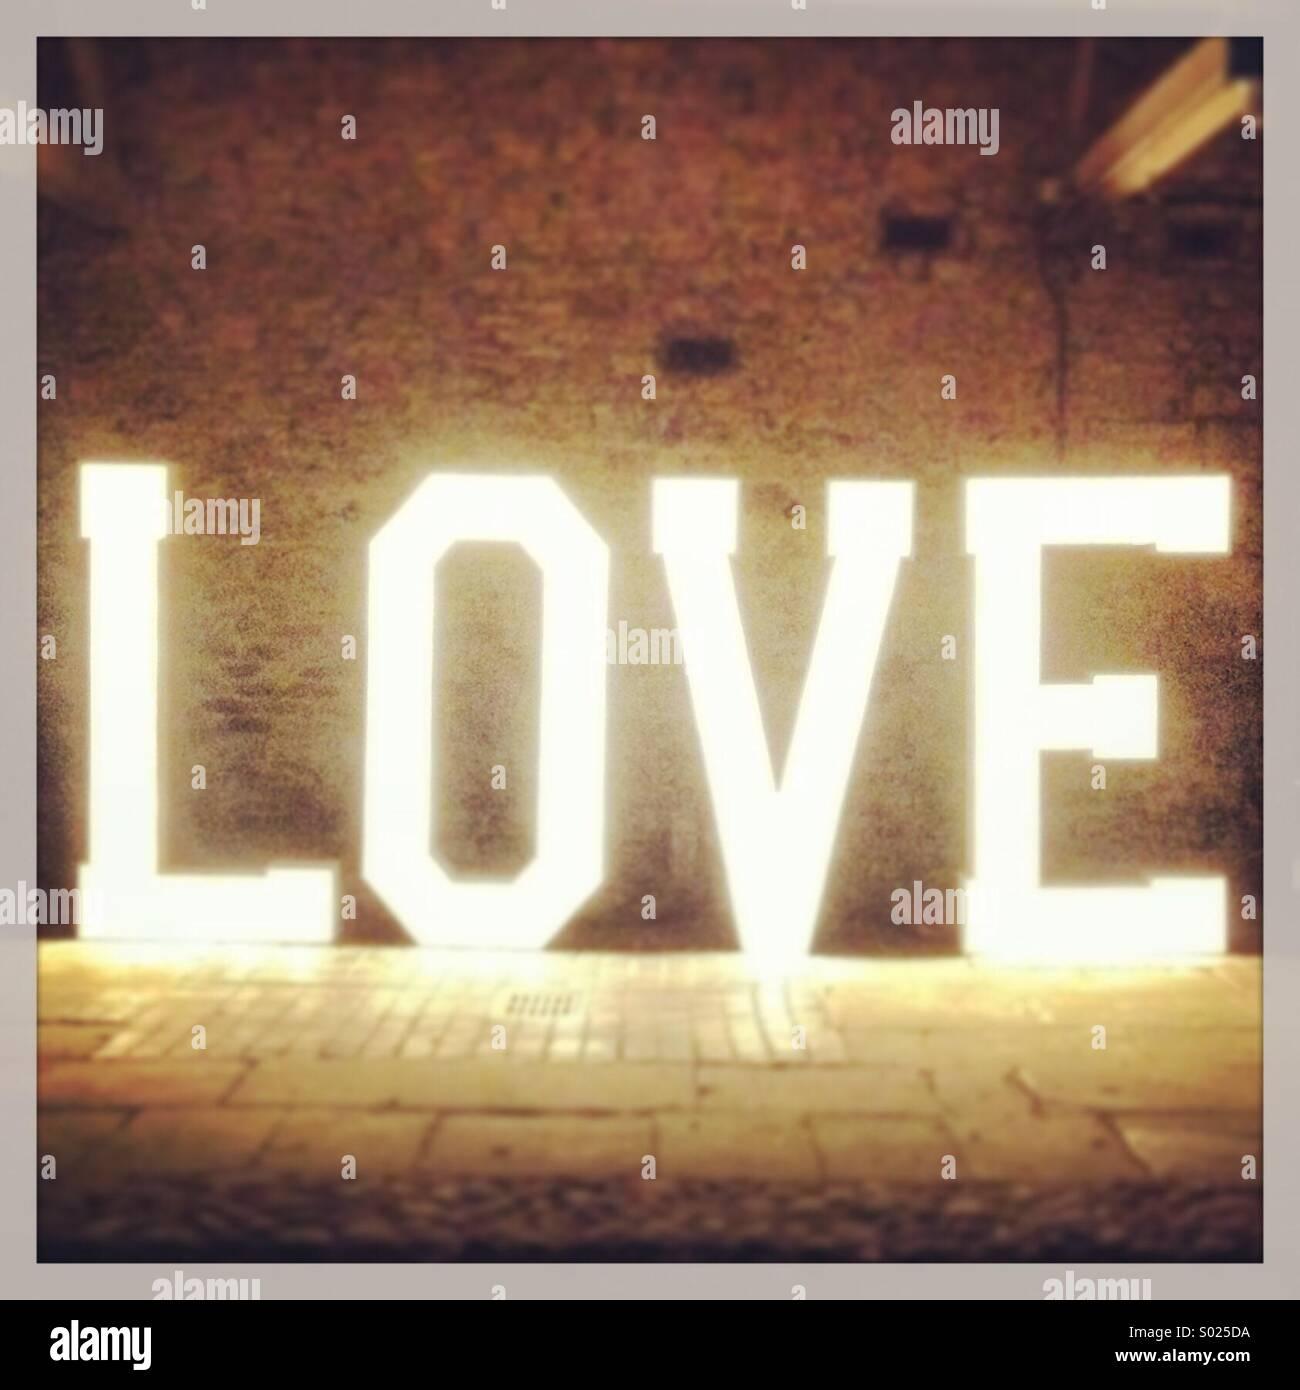 Big Love Word - Stock Image